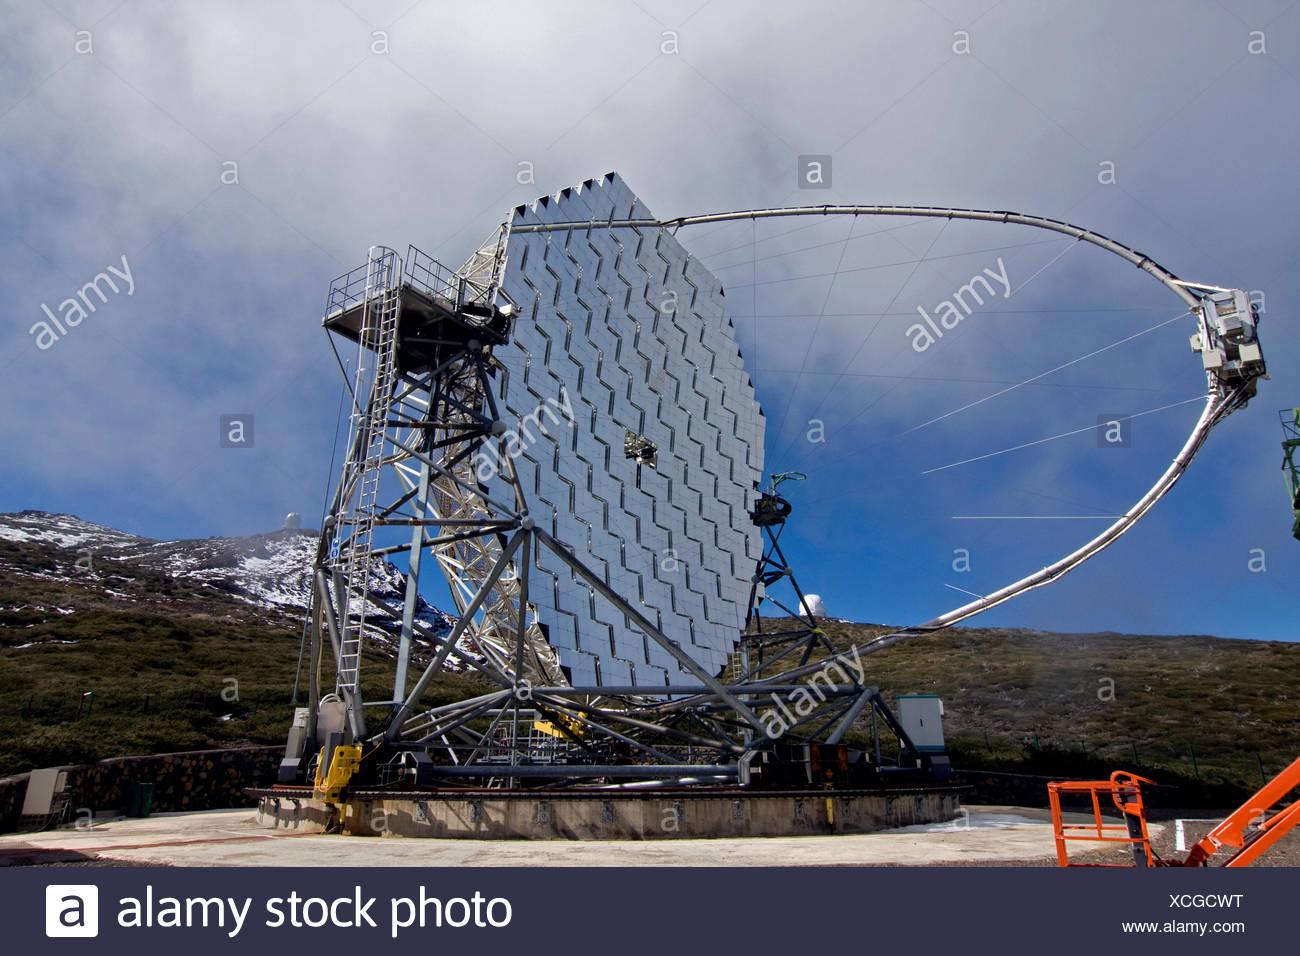 Spanien kanaren teleskop astronomie astrophysik spiegel kanaren